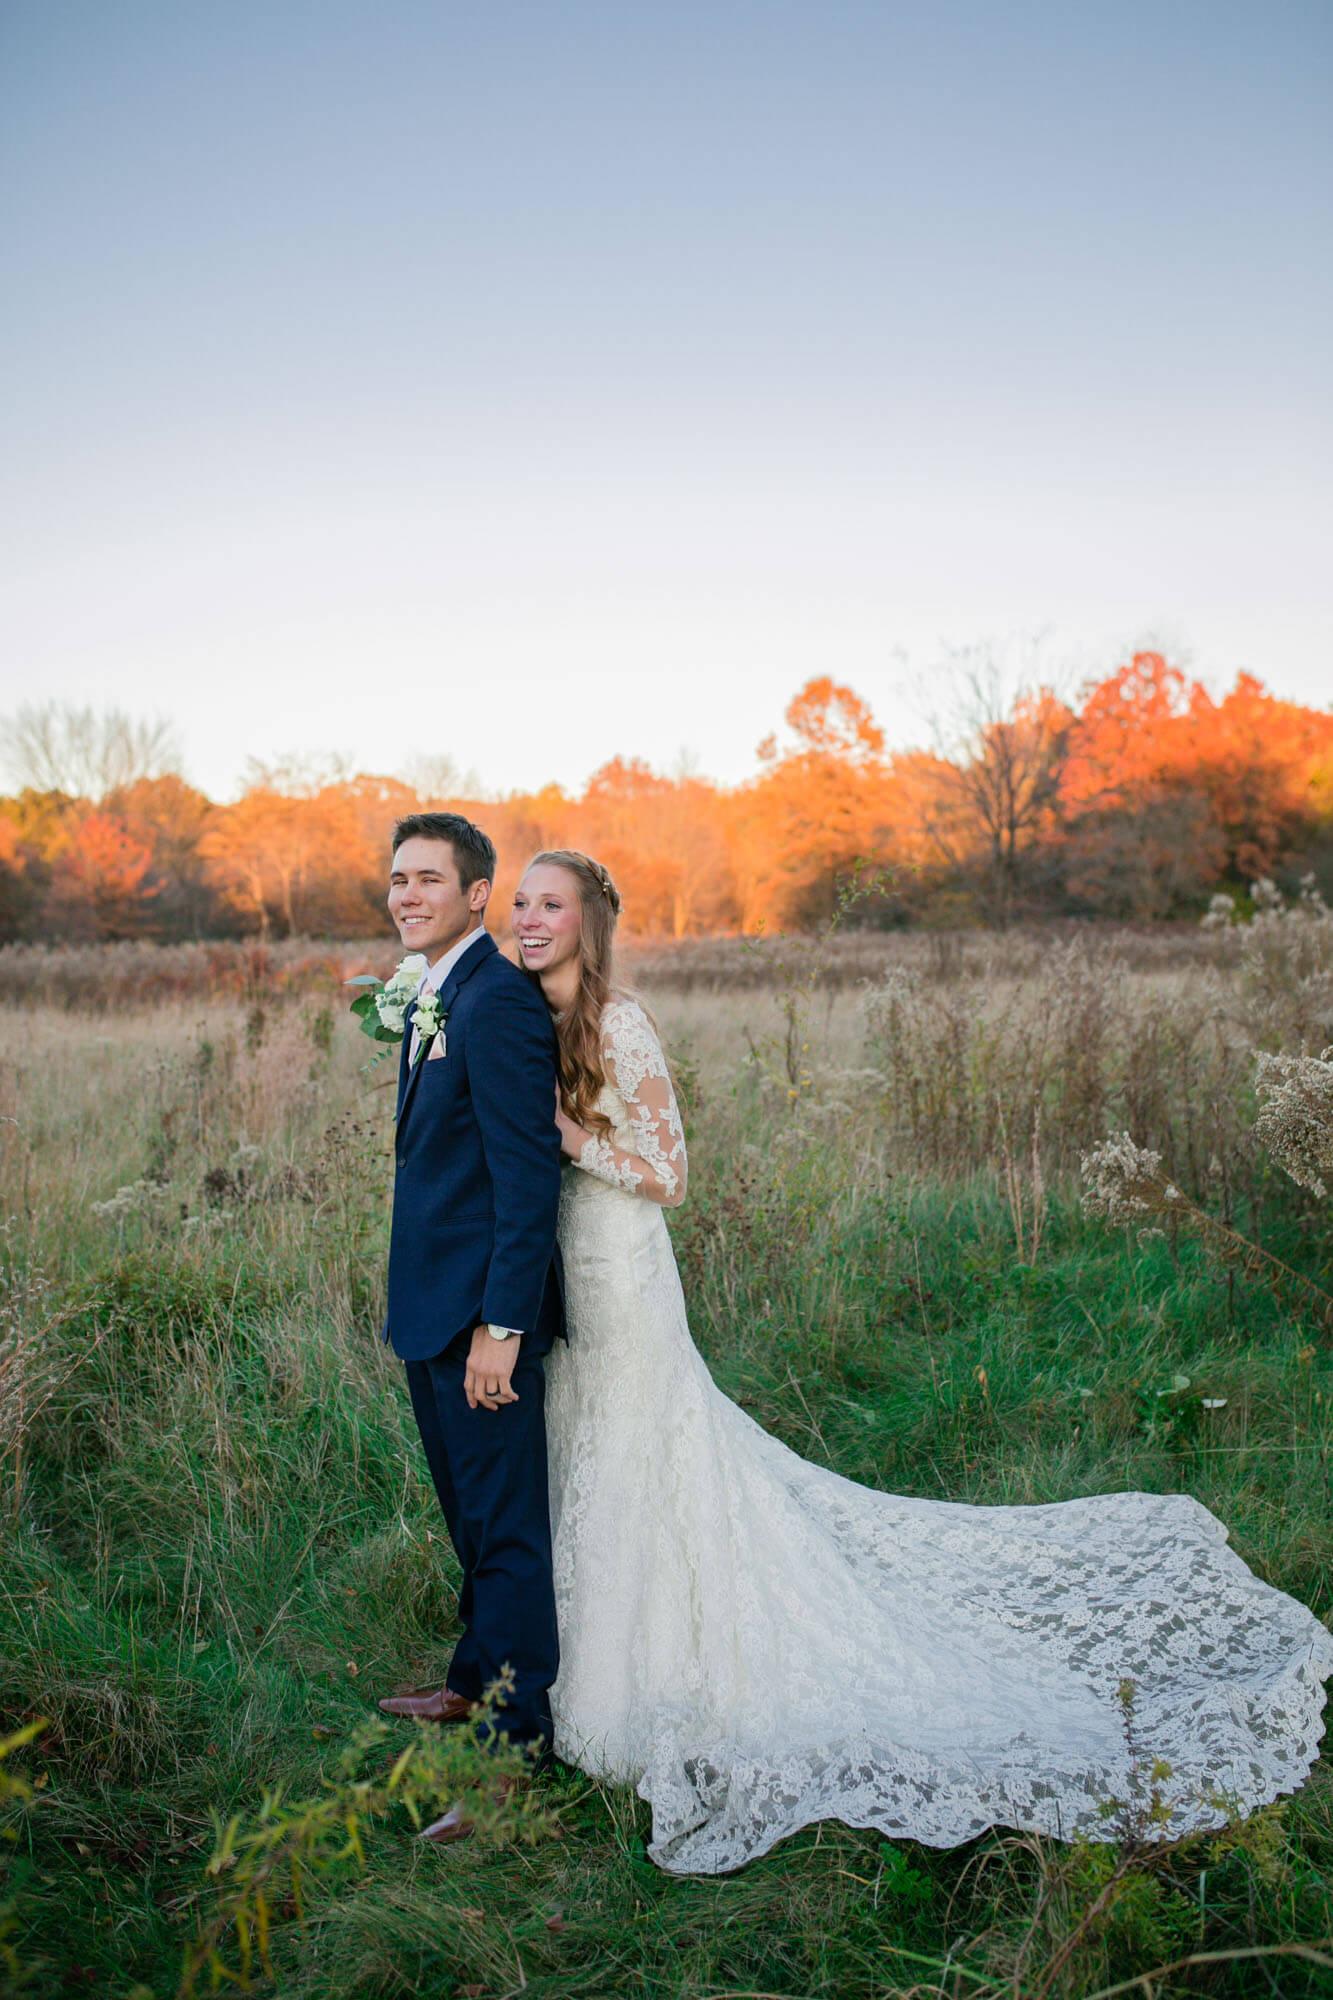 hilton-garden-inn-perrysburg-wedding-photos-182.jpg